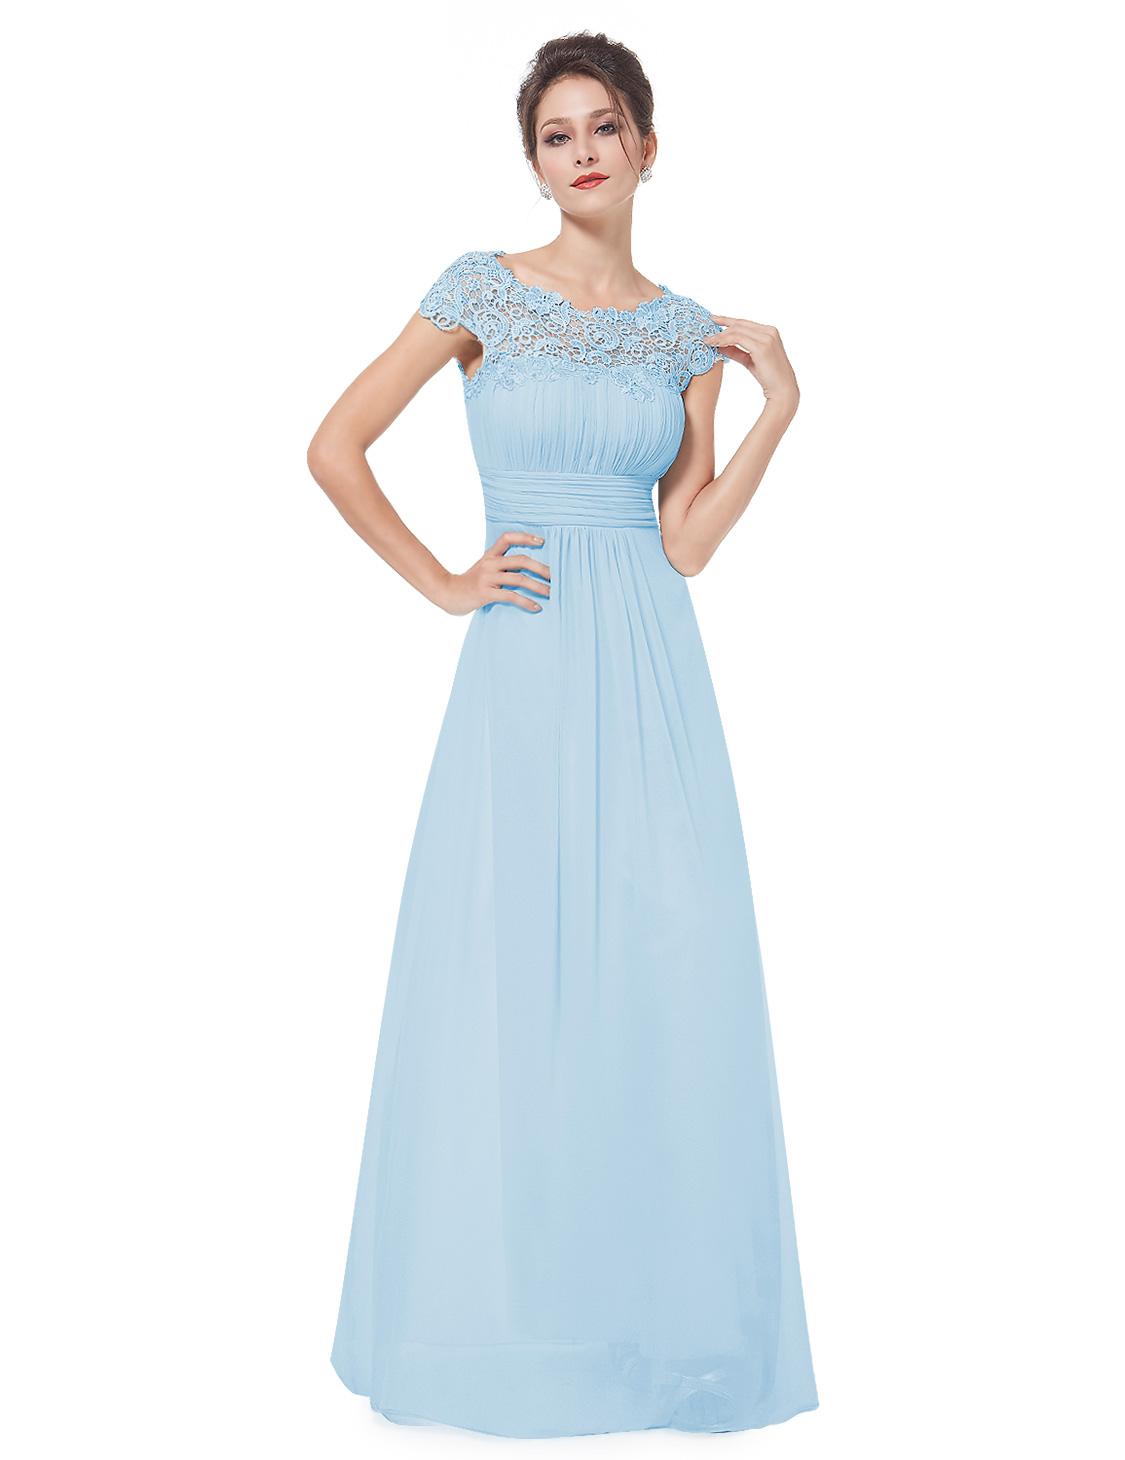 Maxi lace bridesmaid dresses chiffon homecoming formal evening maxi lace bridesmaid dresses chiffon homecoming formal evening ombrellifo Images